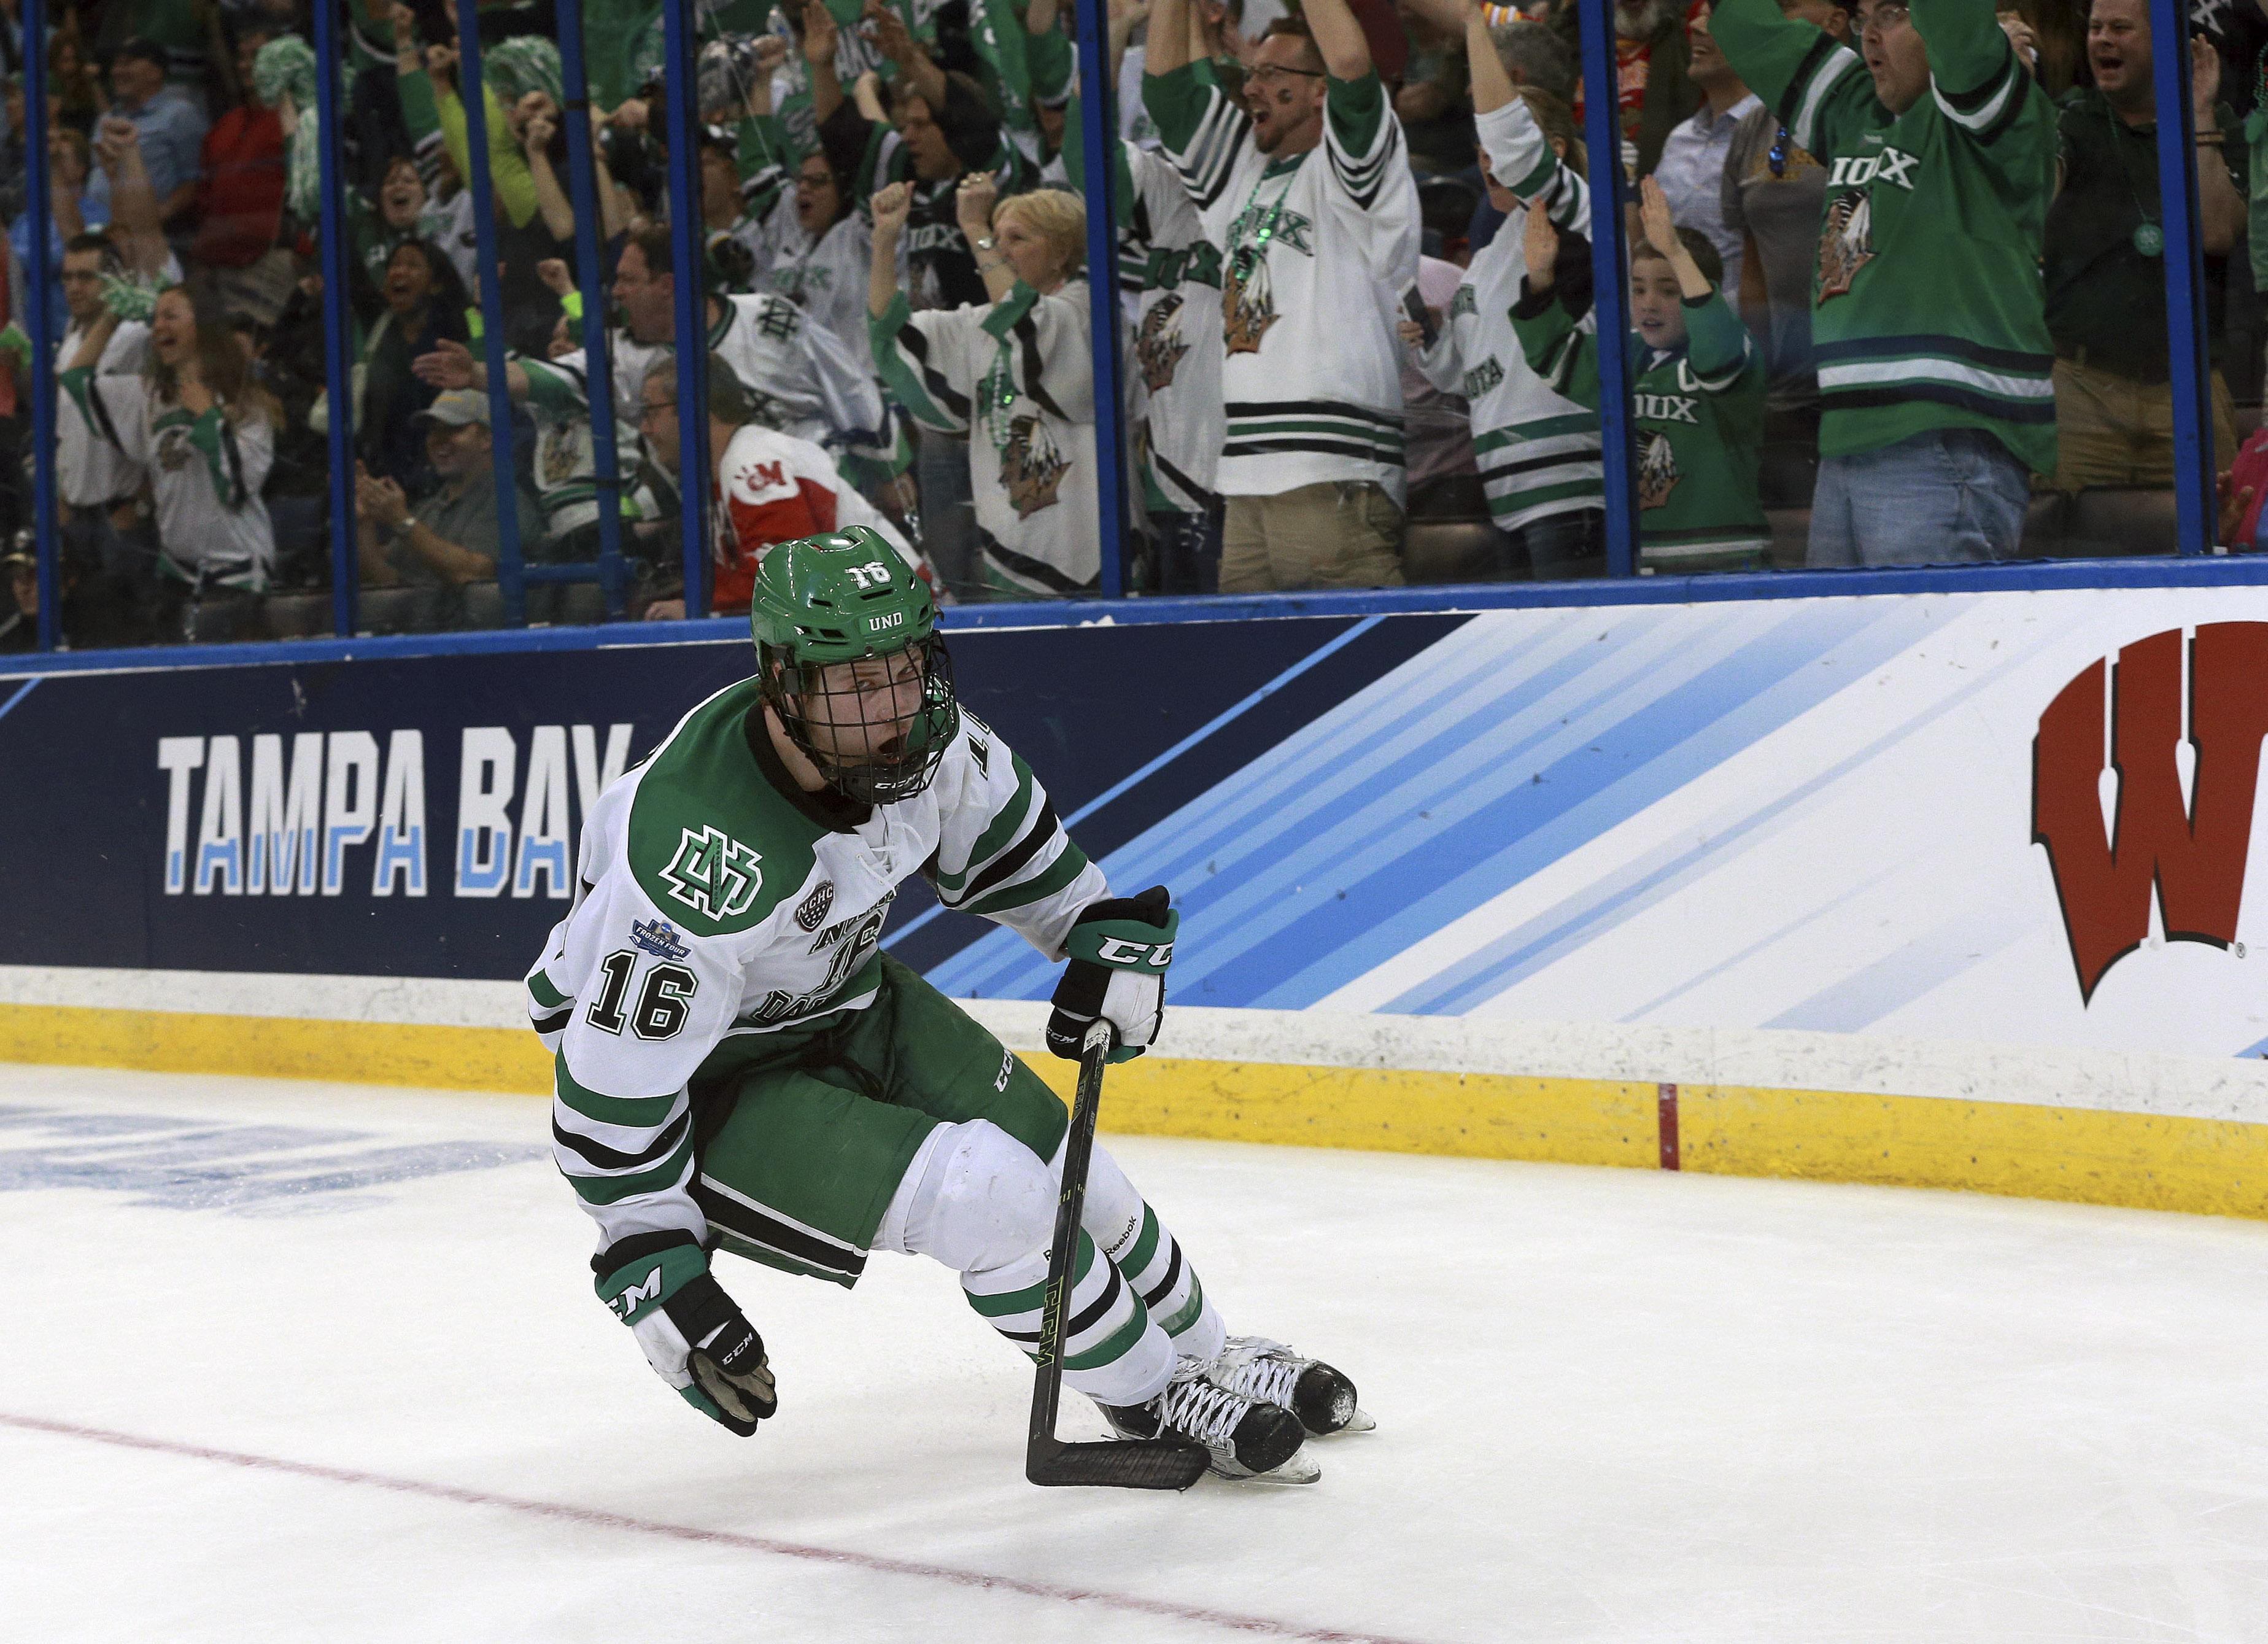 9236265-ncaa-hockey-frozen-four-denver-vs-north-dakota